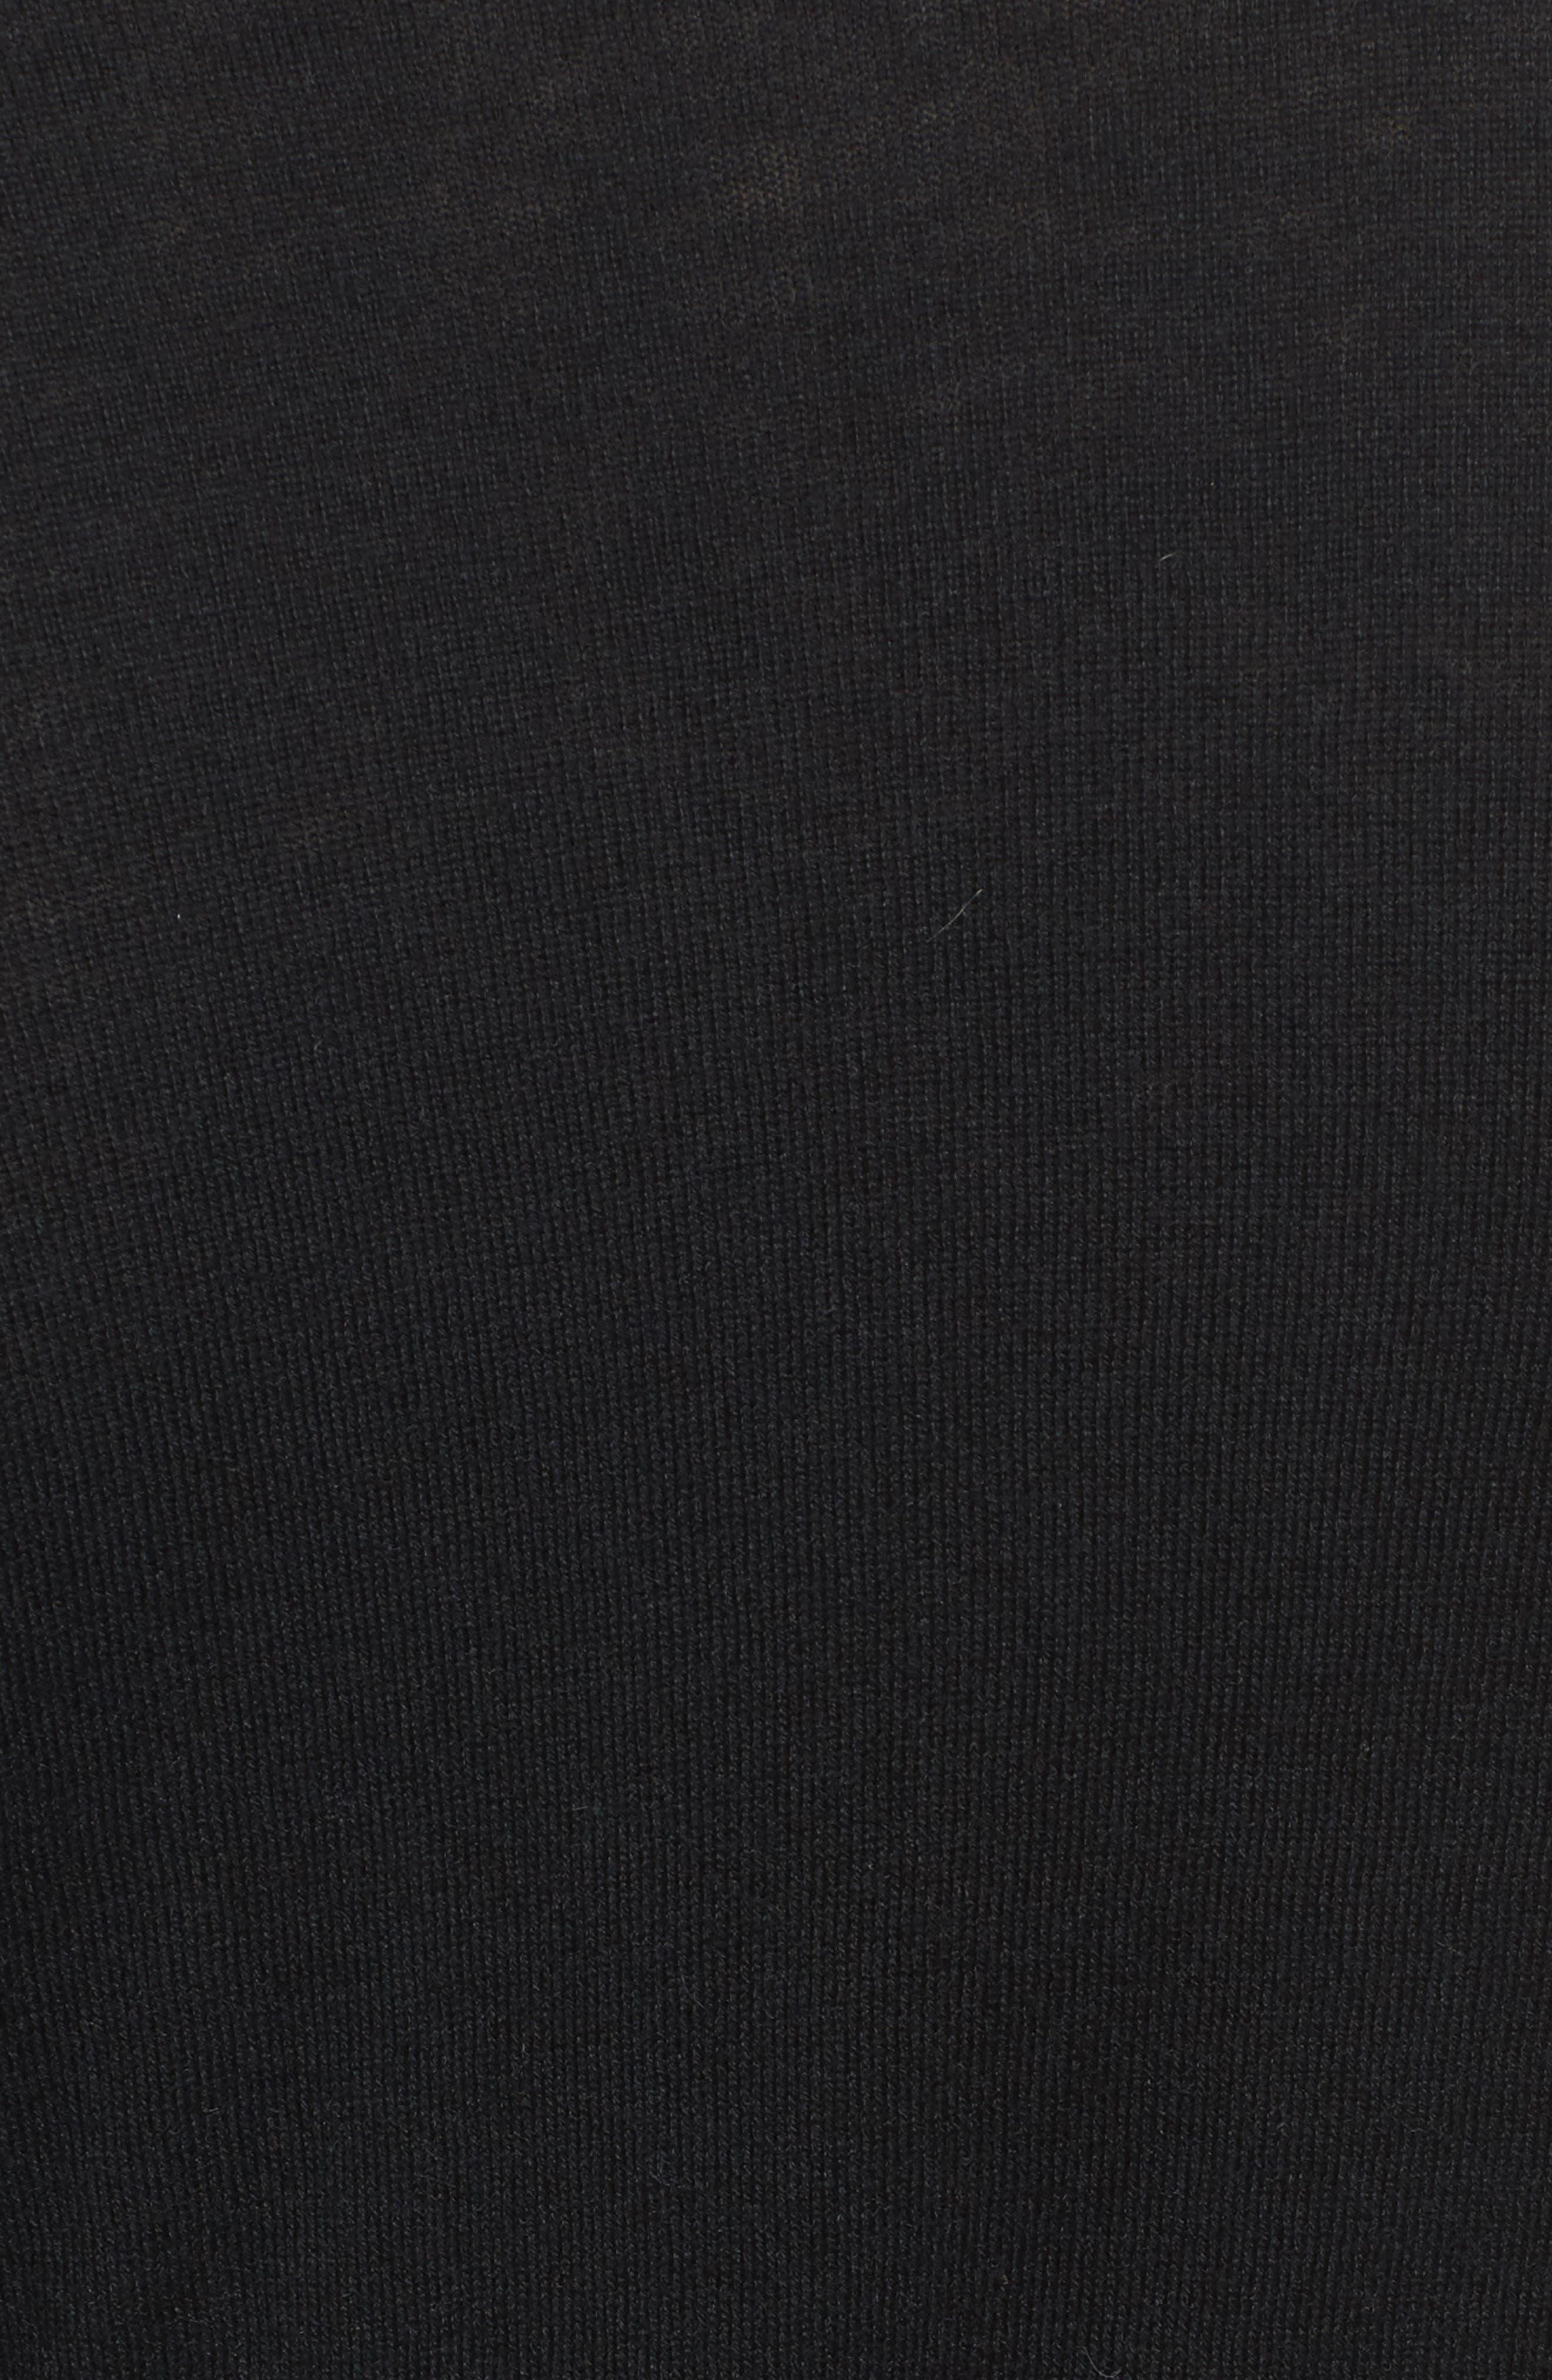 Ballet Wrap Sweater,                             Alternate thumbnail 5, color,                             001